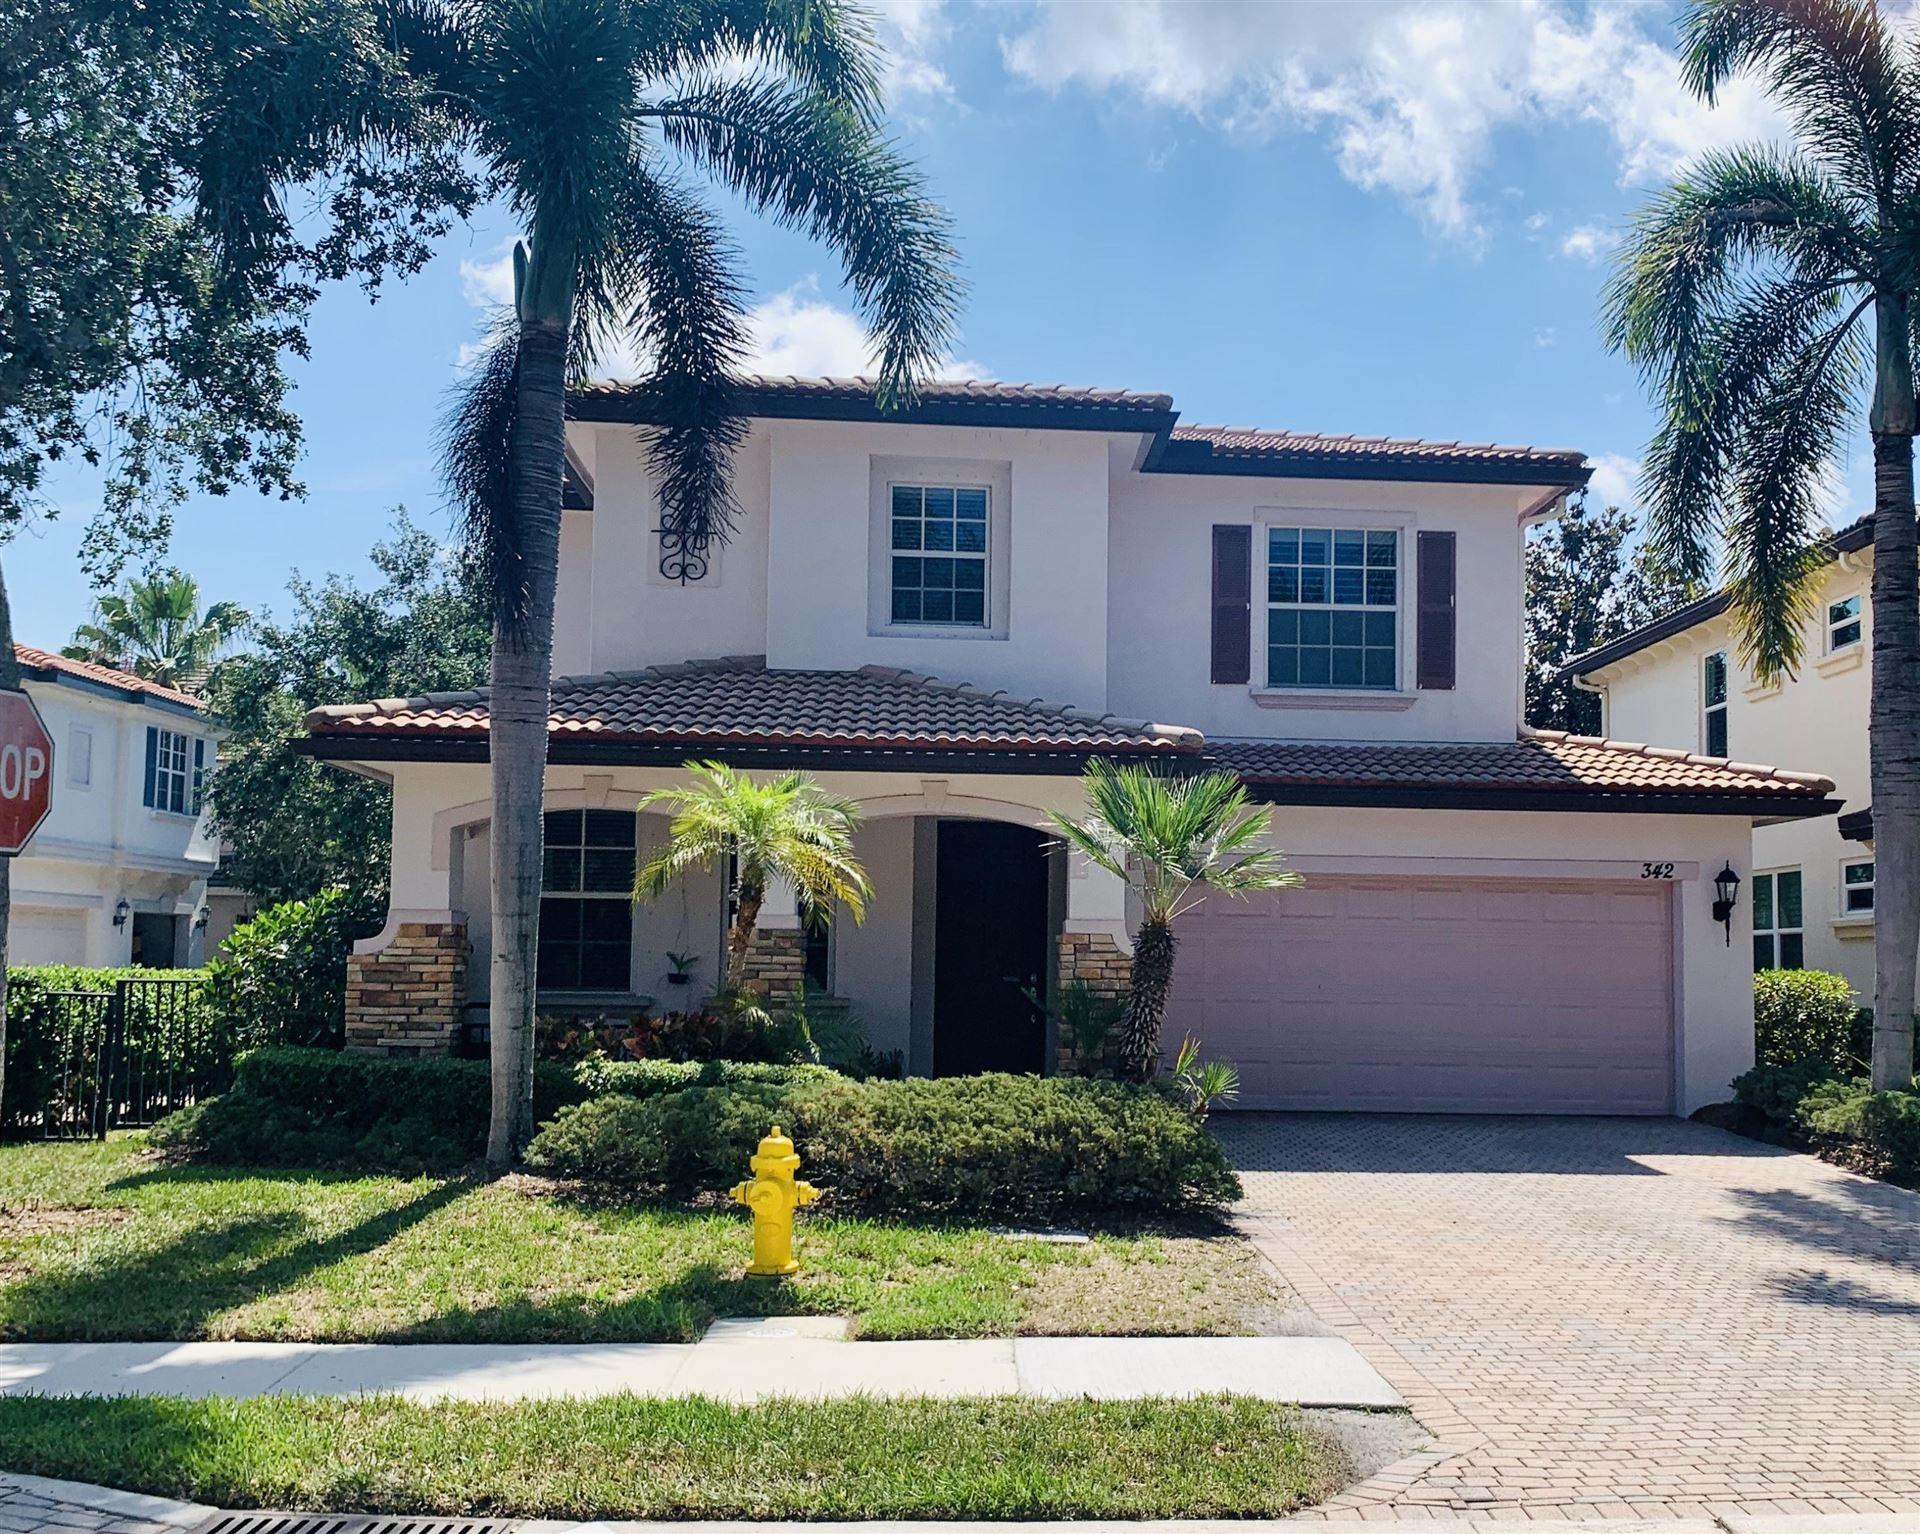 Photo of 342 October Street, Palm Beach Gardens, FL 33410 (MLS # RX-10716061)